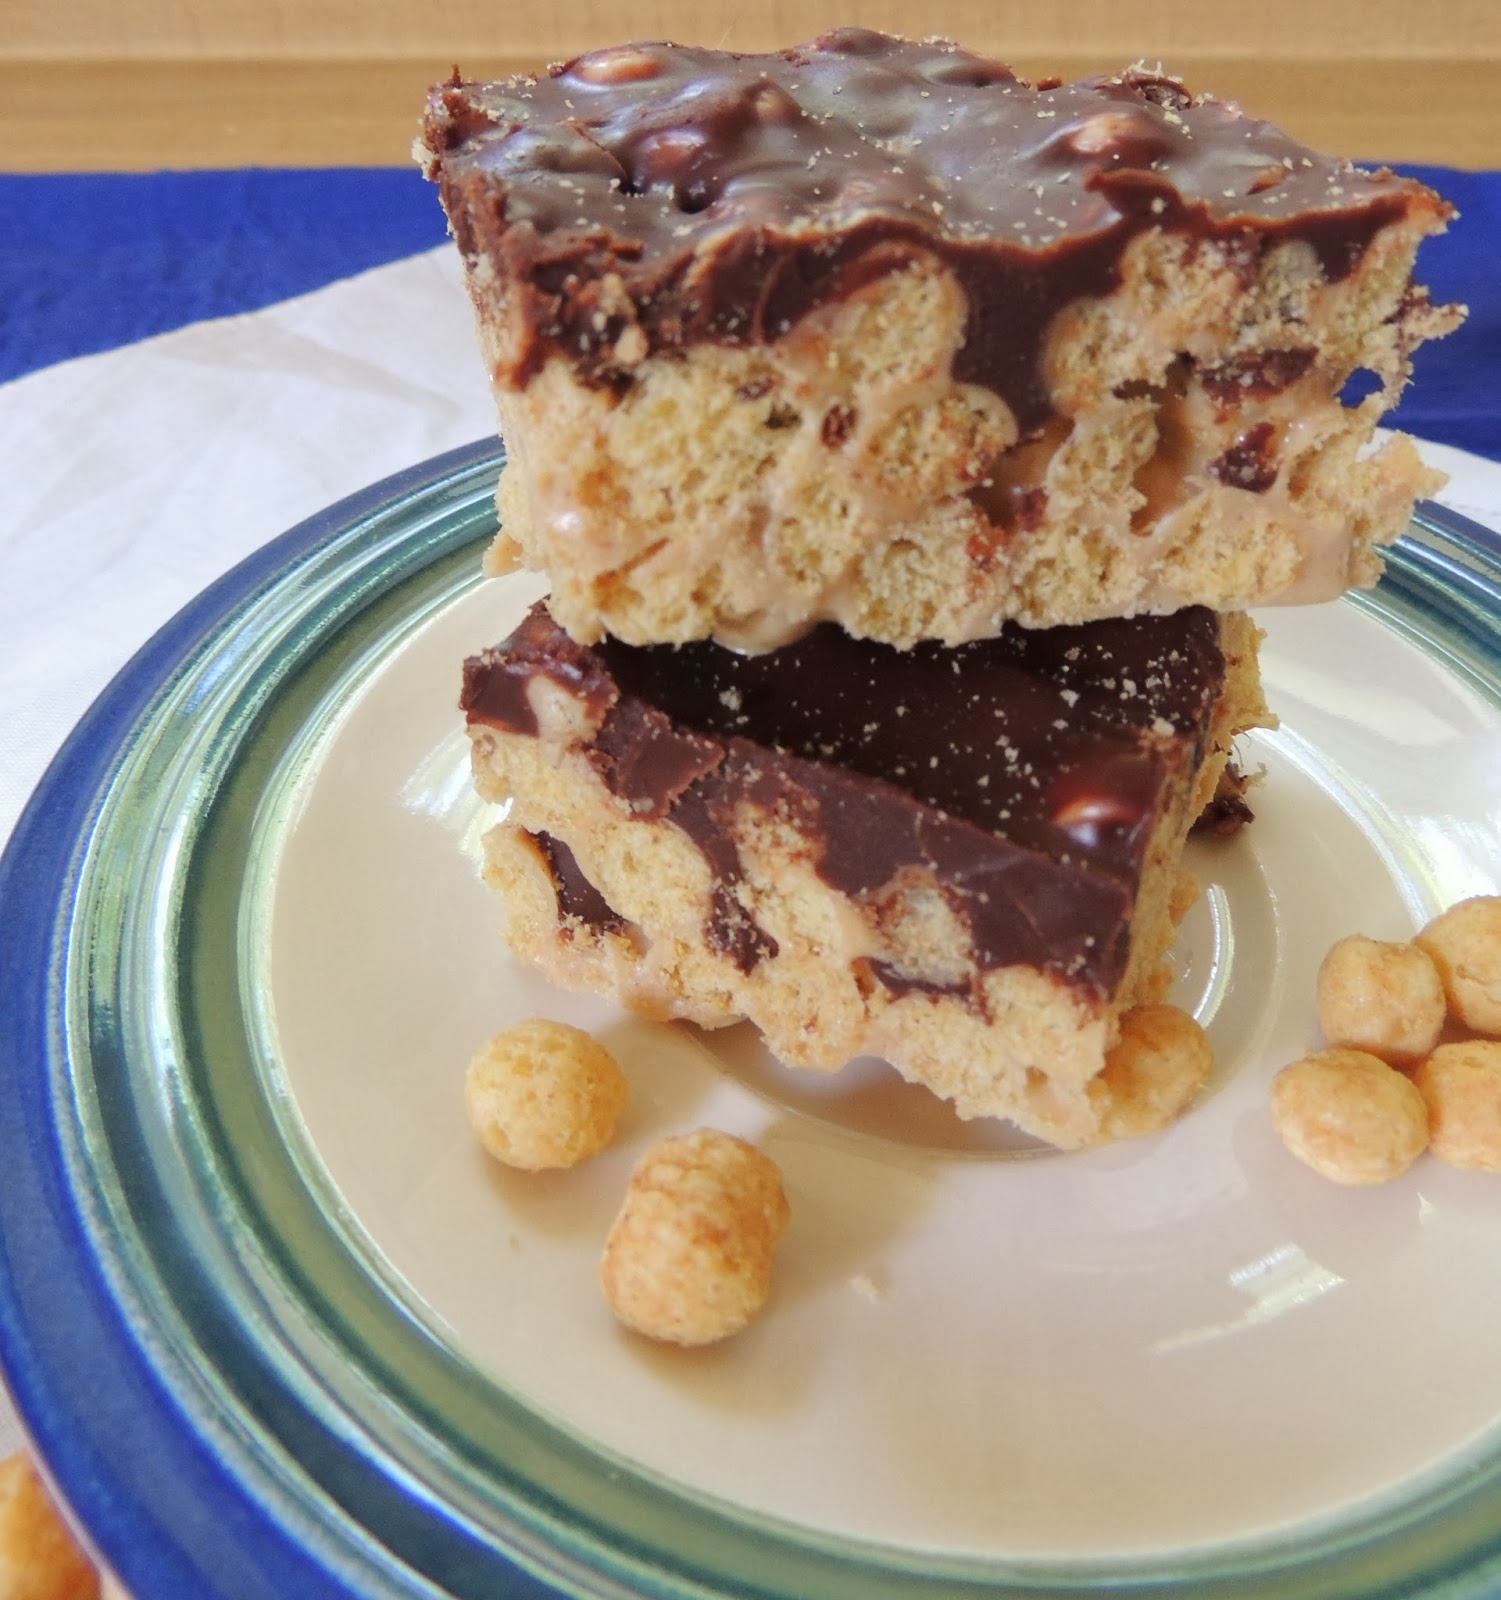 Chocolate Peanut Butter Crunch Bars